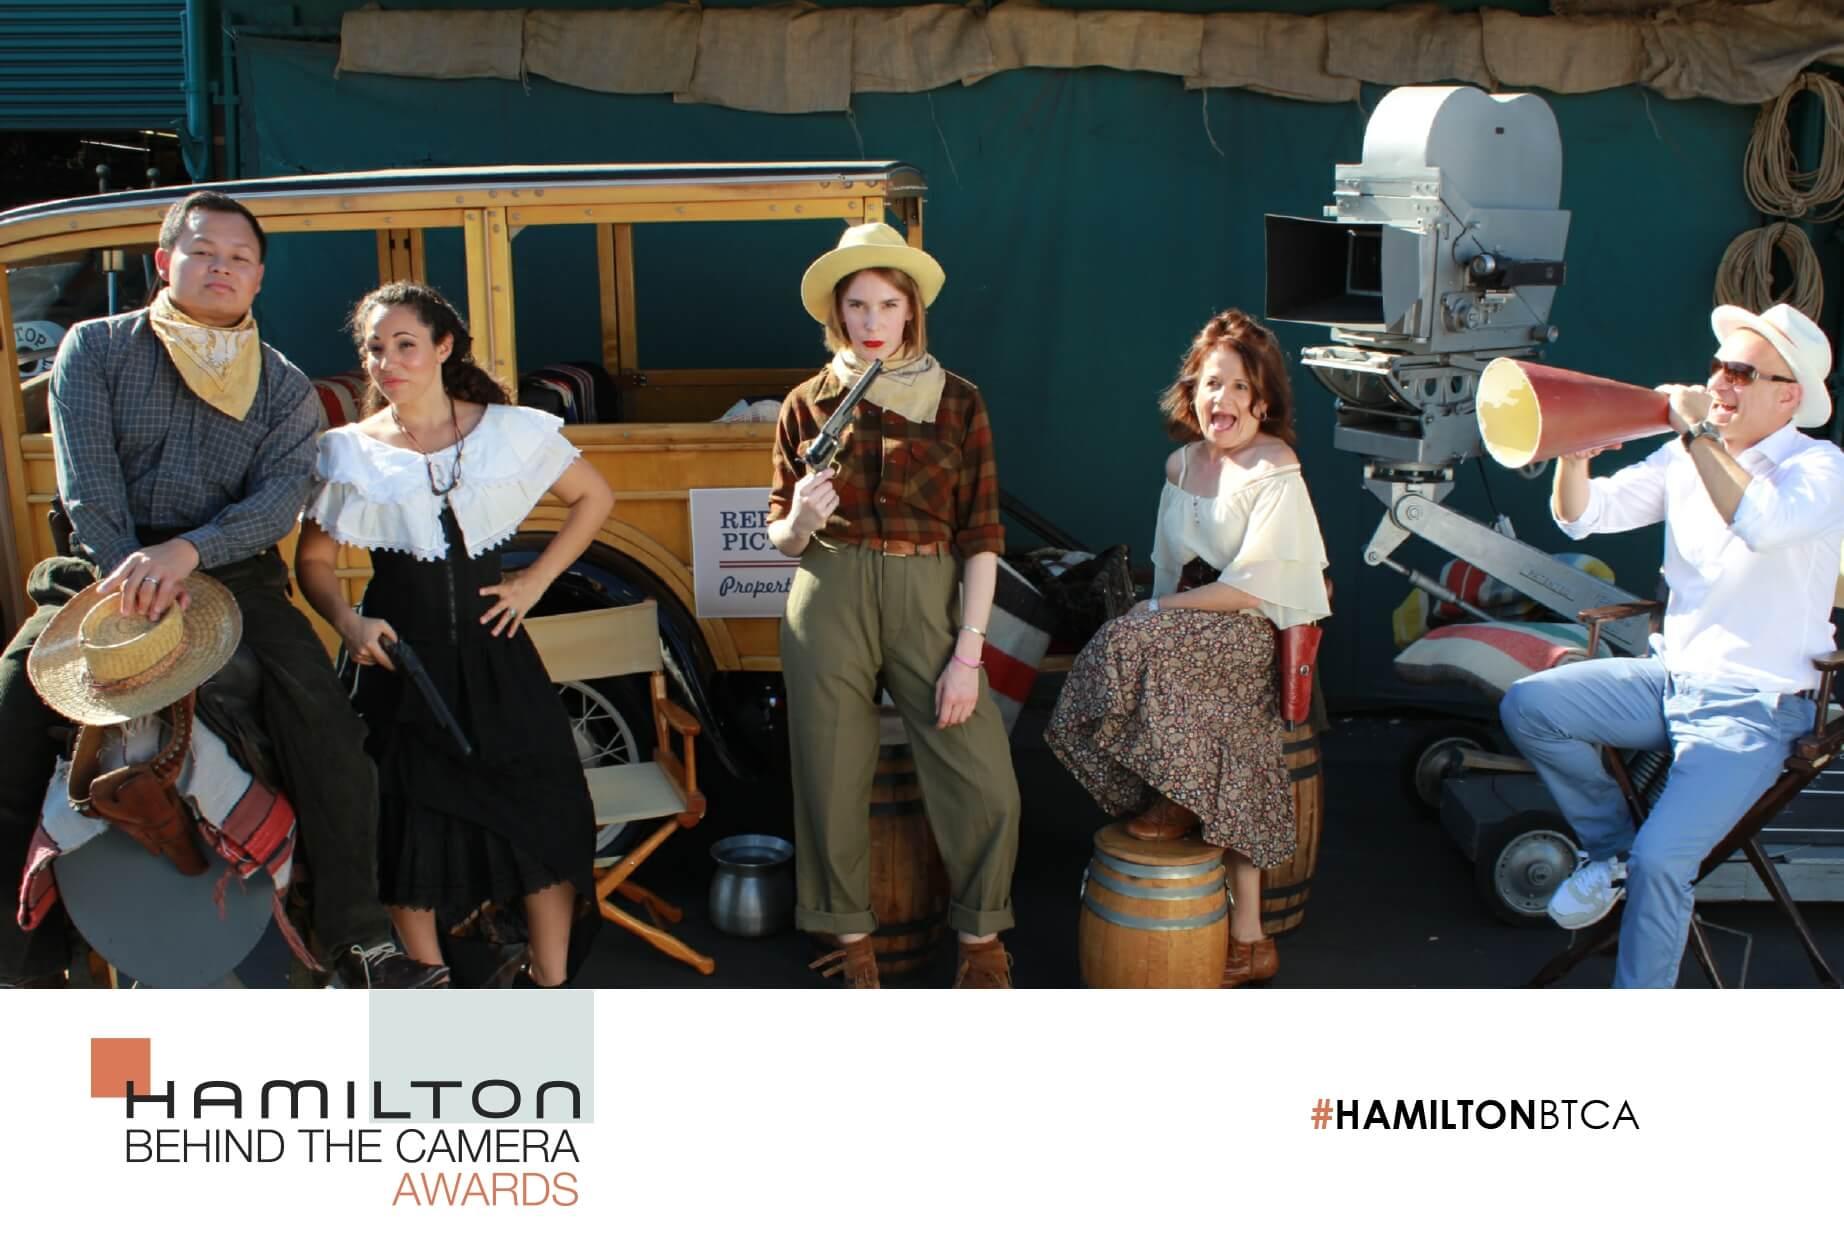 Hamilton BTCA Social Photo Booth Kiosk